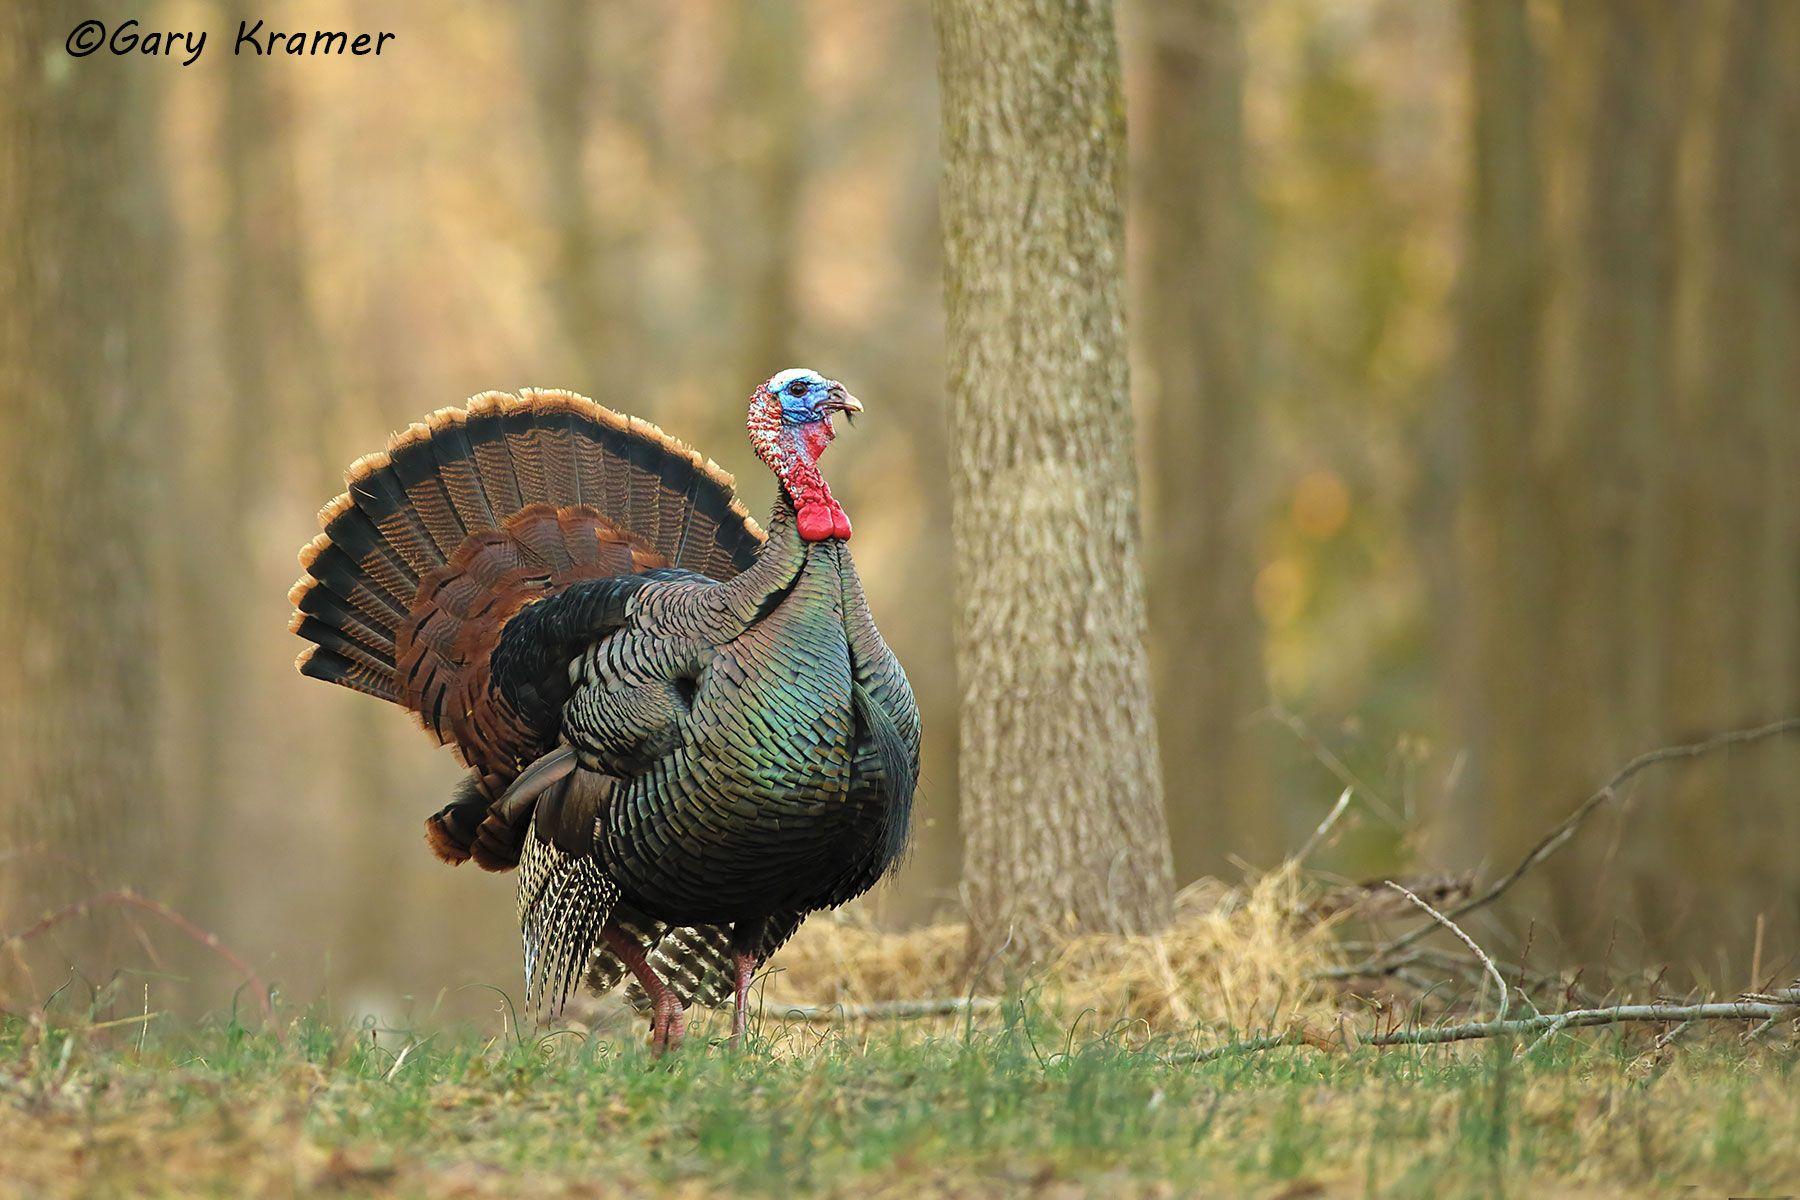 Wild Turkey (Eastern) (Meleagris gallopavo silvestris) - NBGTe#1014d